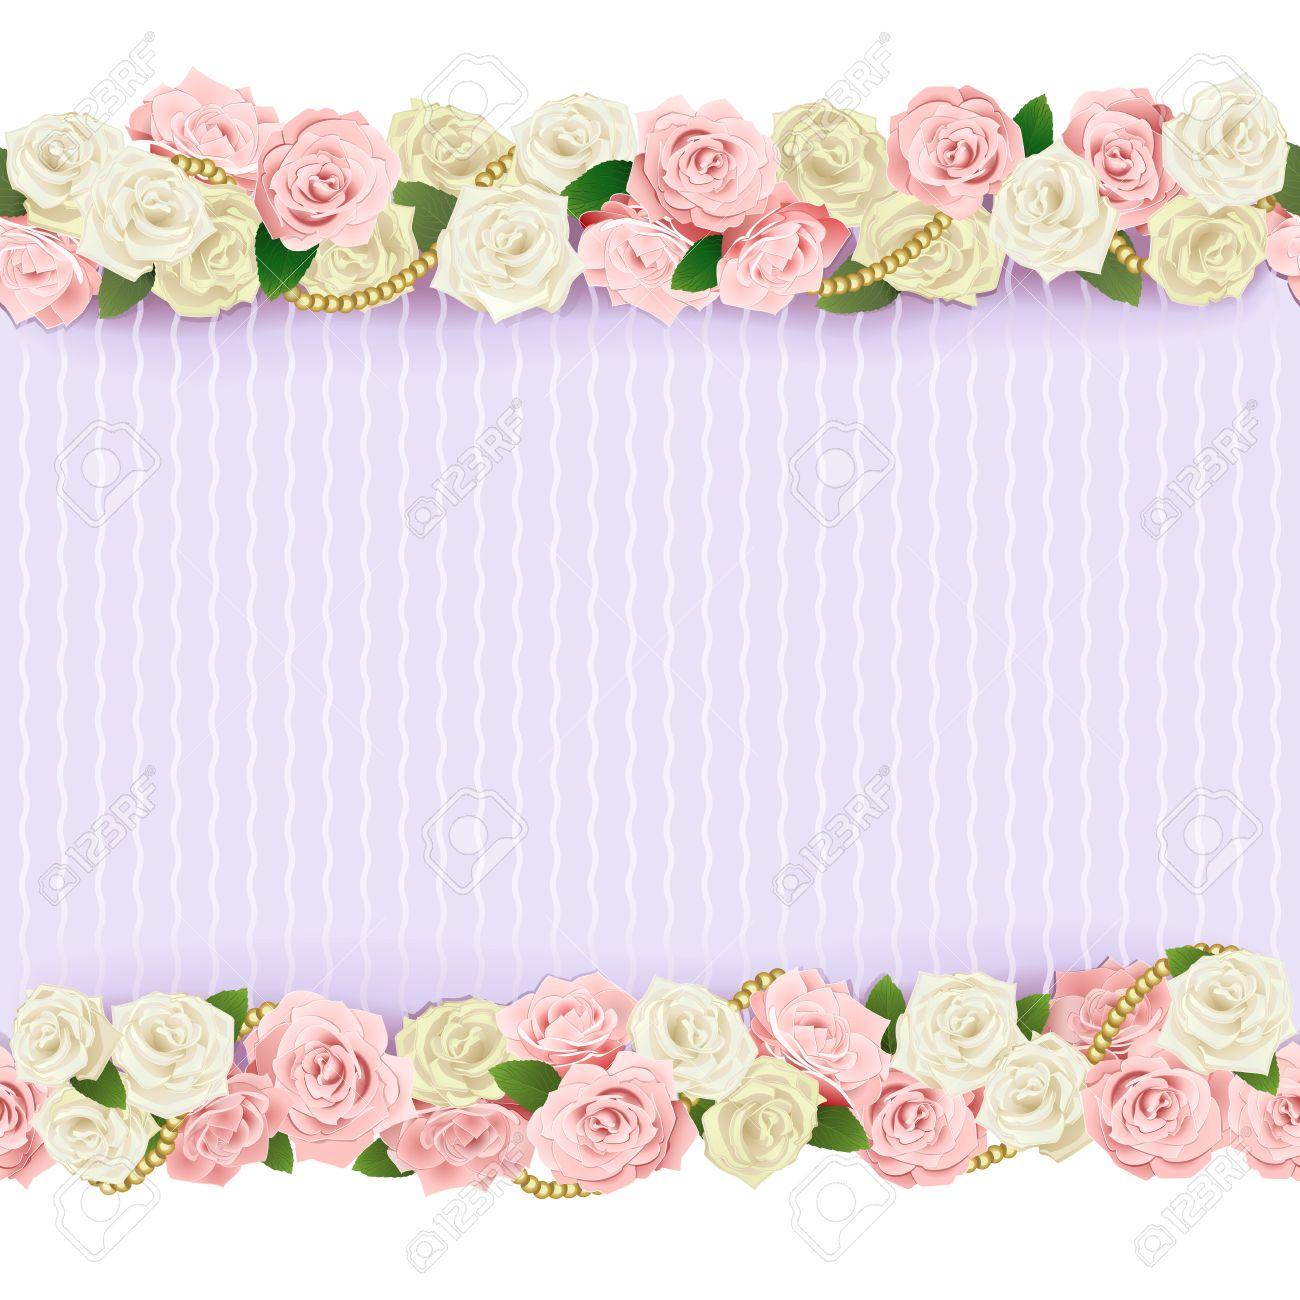 Vector Wedding Flower Frame Isolated On White Background Royalty